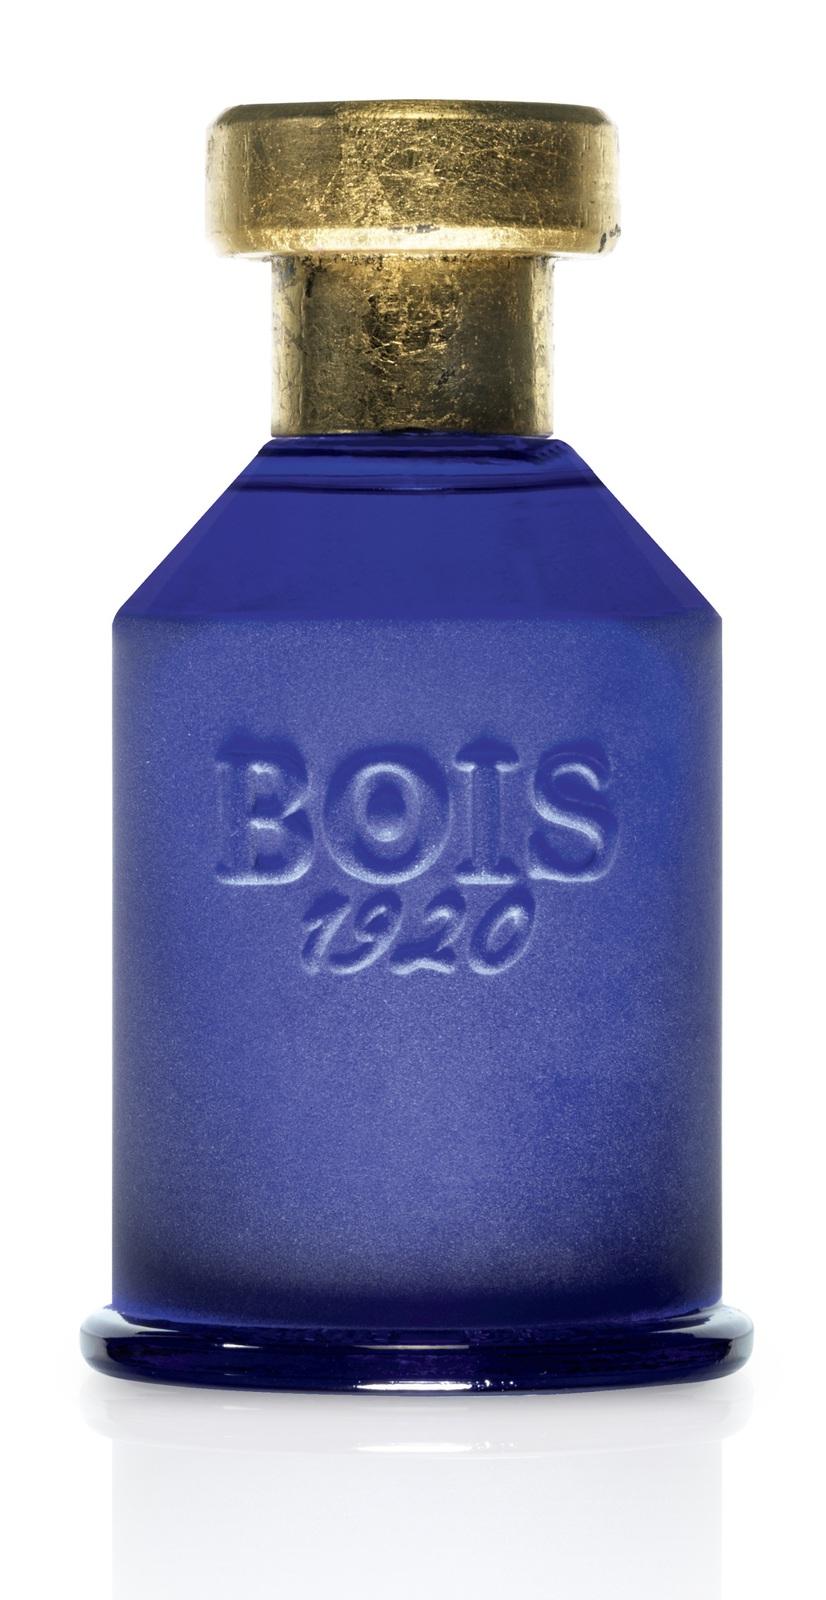 OLTREMARE by BOIS 1920 5ml Travel Spray Bigarade Rhubarb Ambergris PERFUME